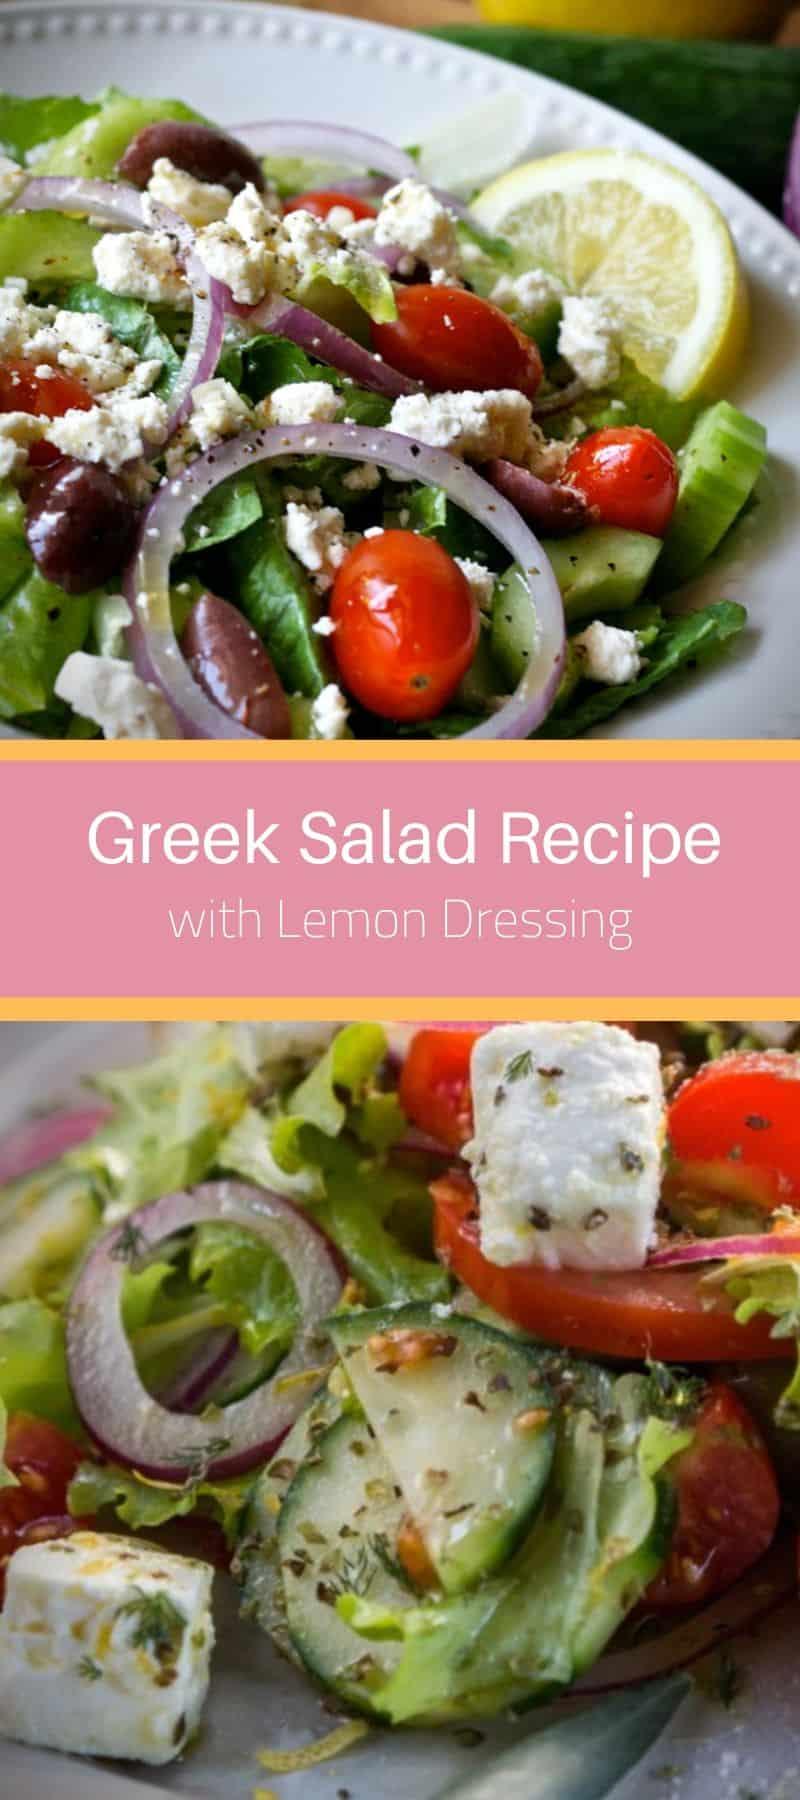 Greek Salad Recipe with Lemon Dressing 3